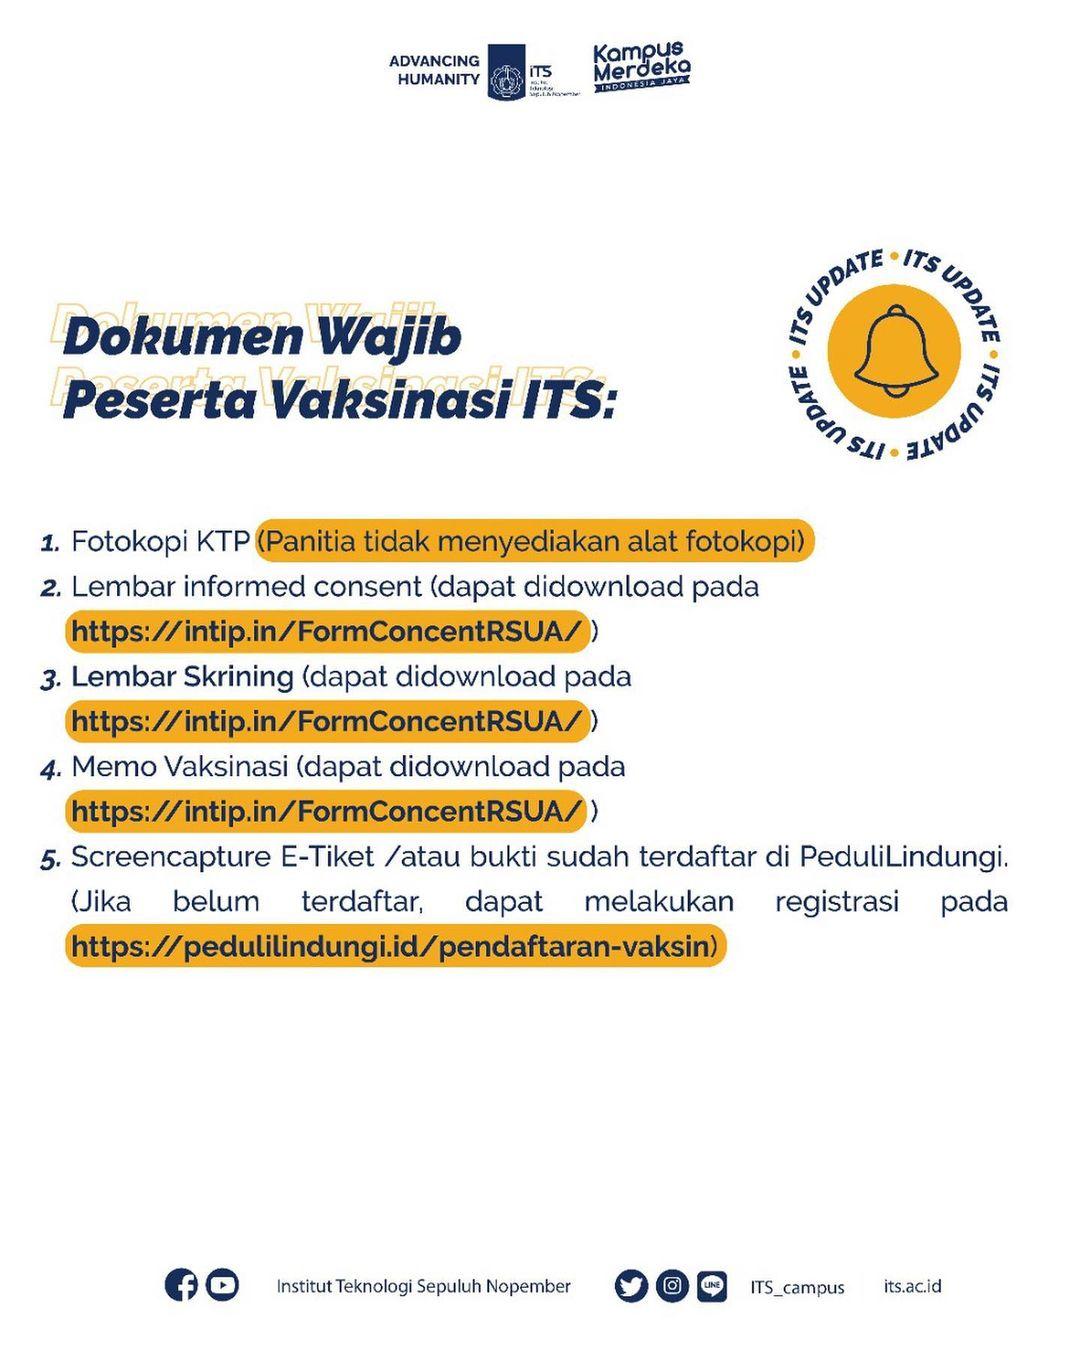 Dokumen Wajib Peserta Vaksinasi ITS